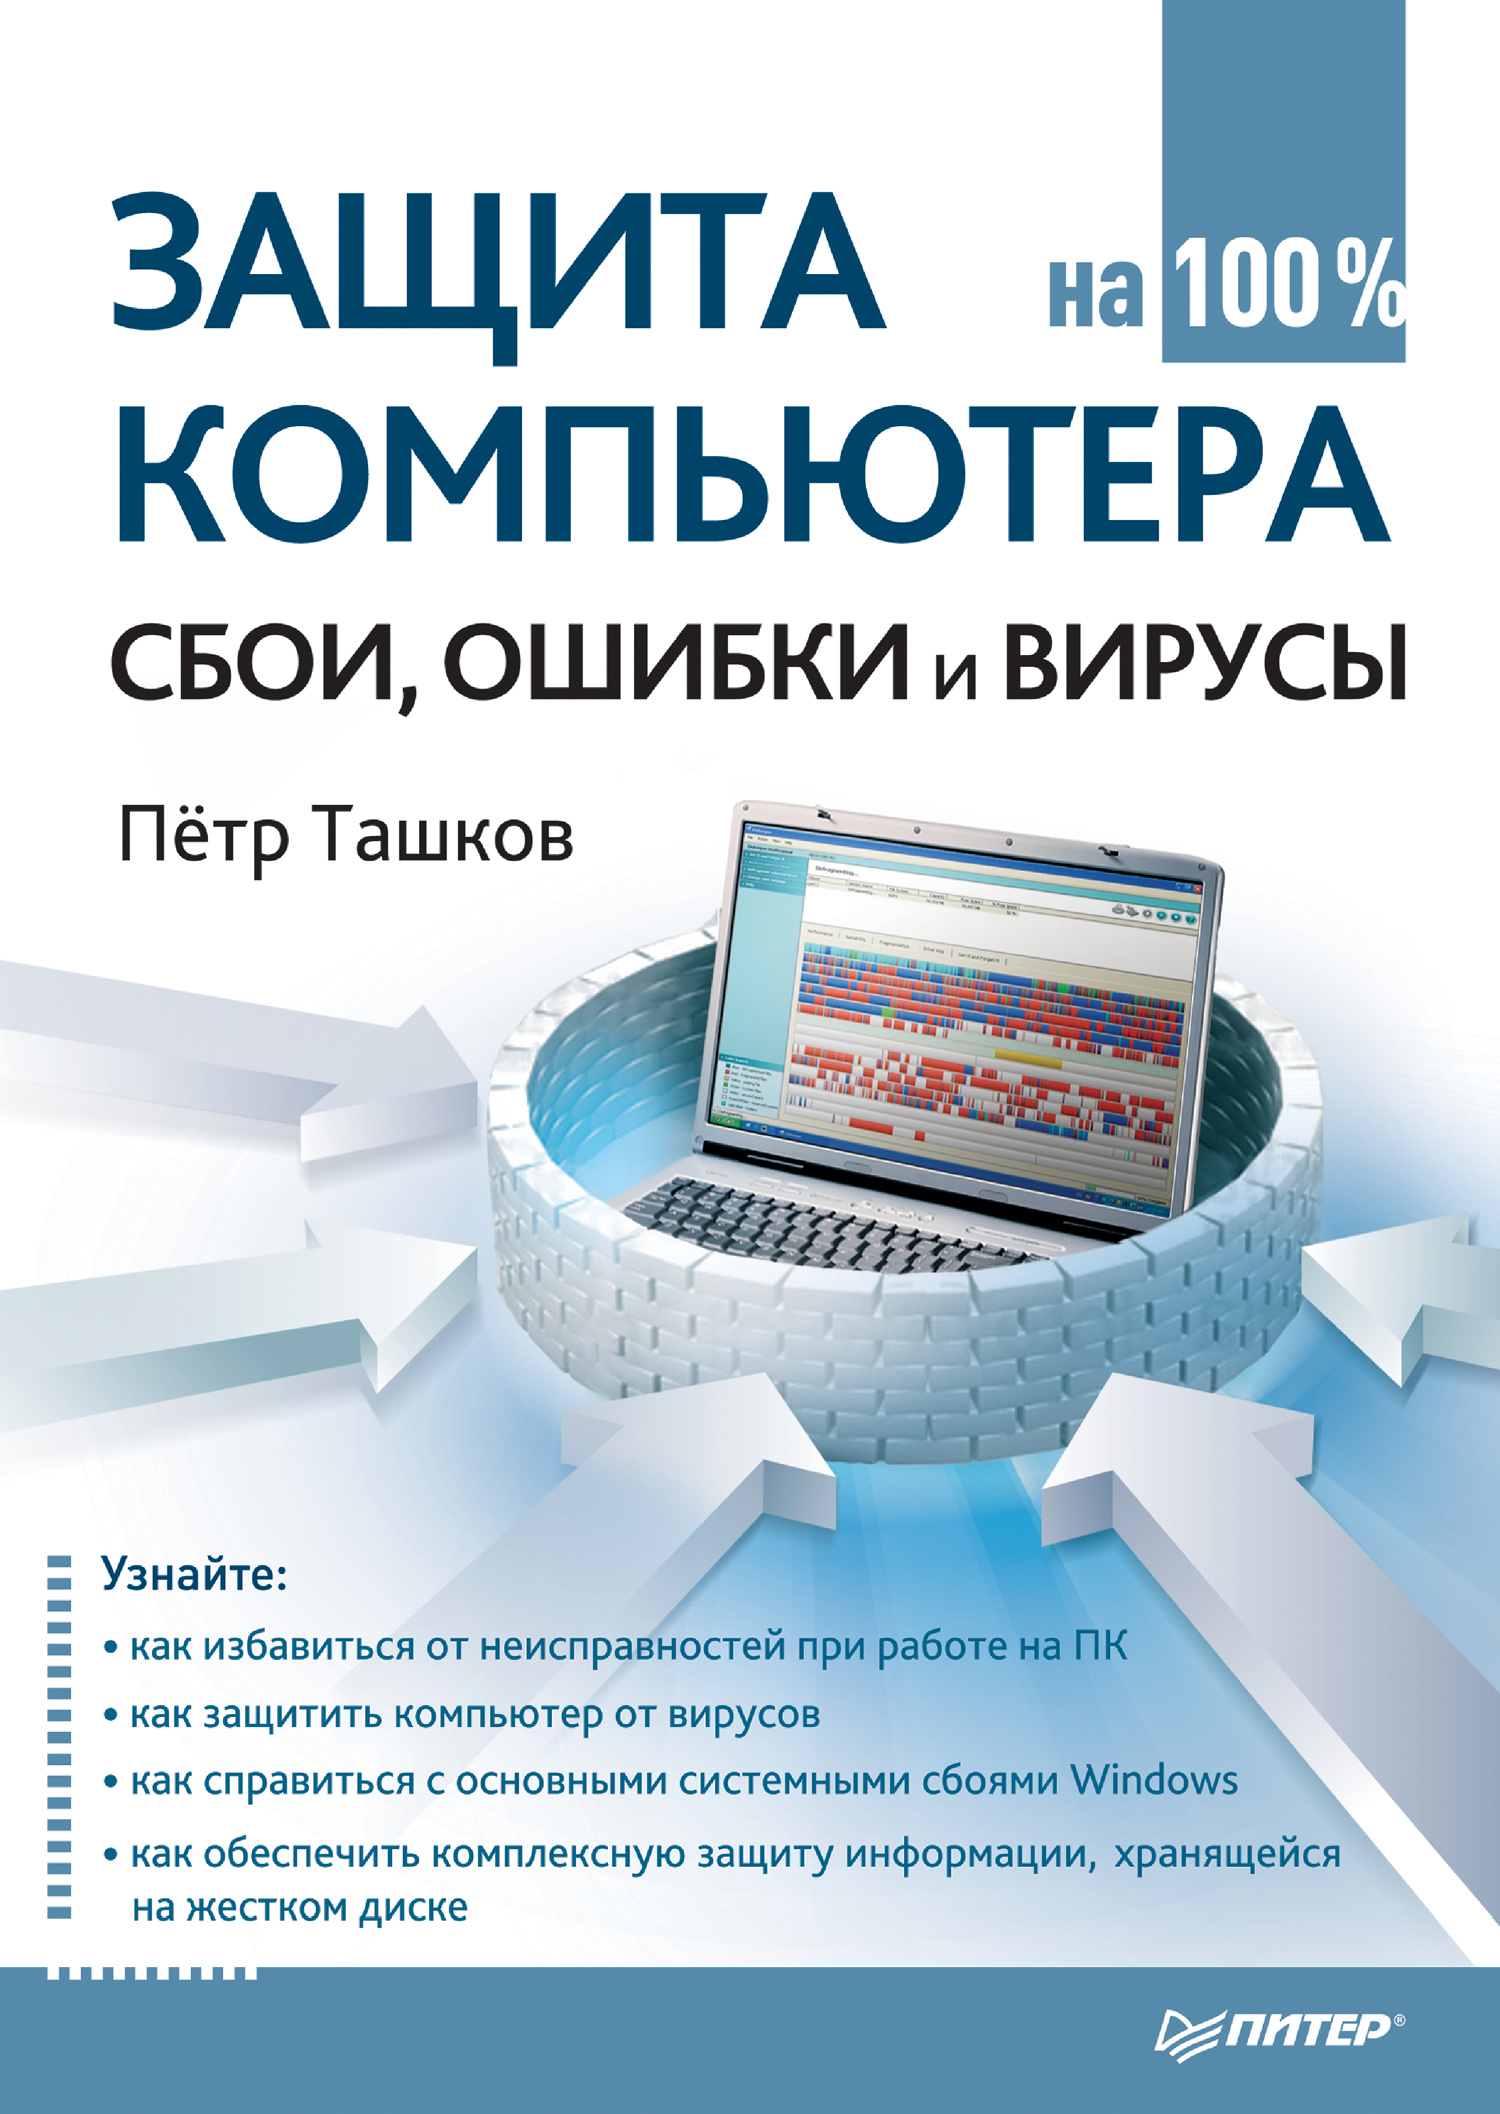 Петр Ташков Защита компьютера на 100%: cбои, ошибки и вирусы петр ташков восстанавливаем данные на 100%